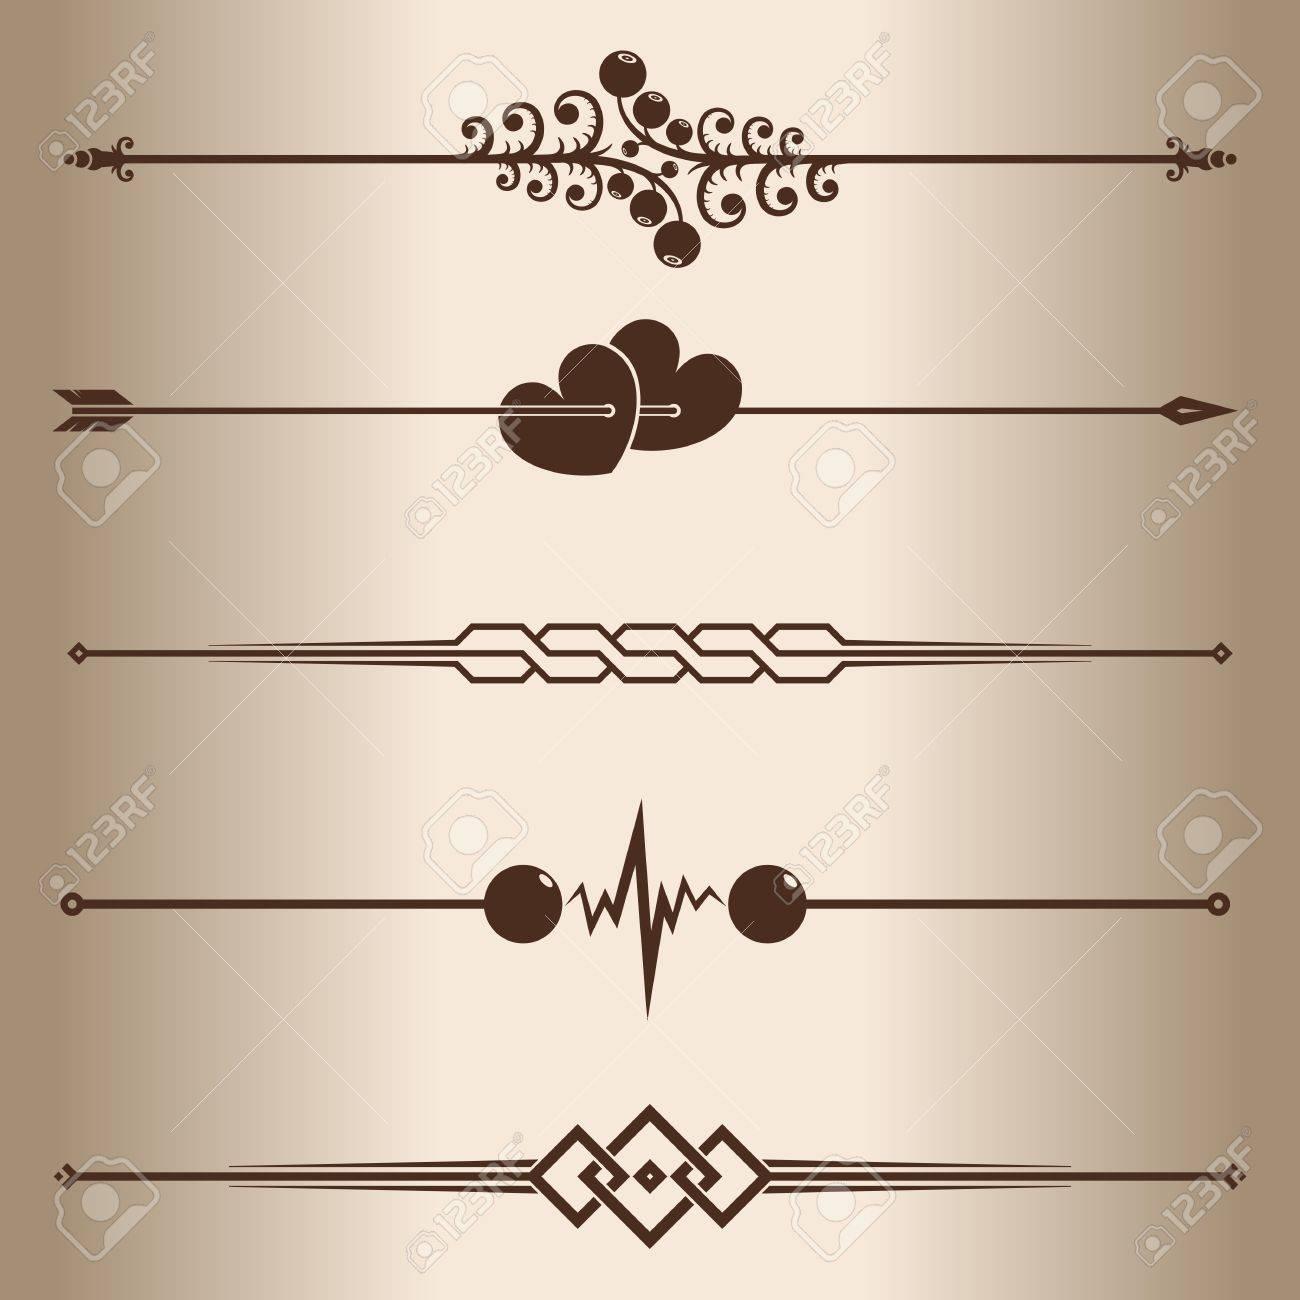 decorative lines elements for design decorative line dividers